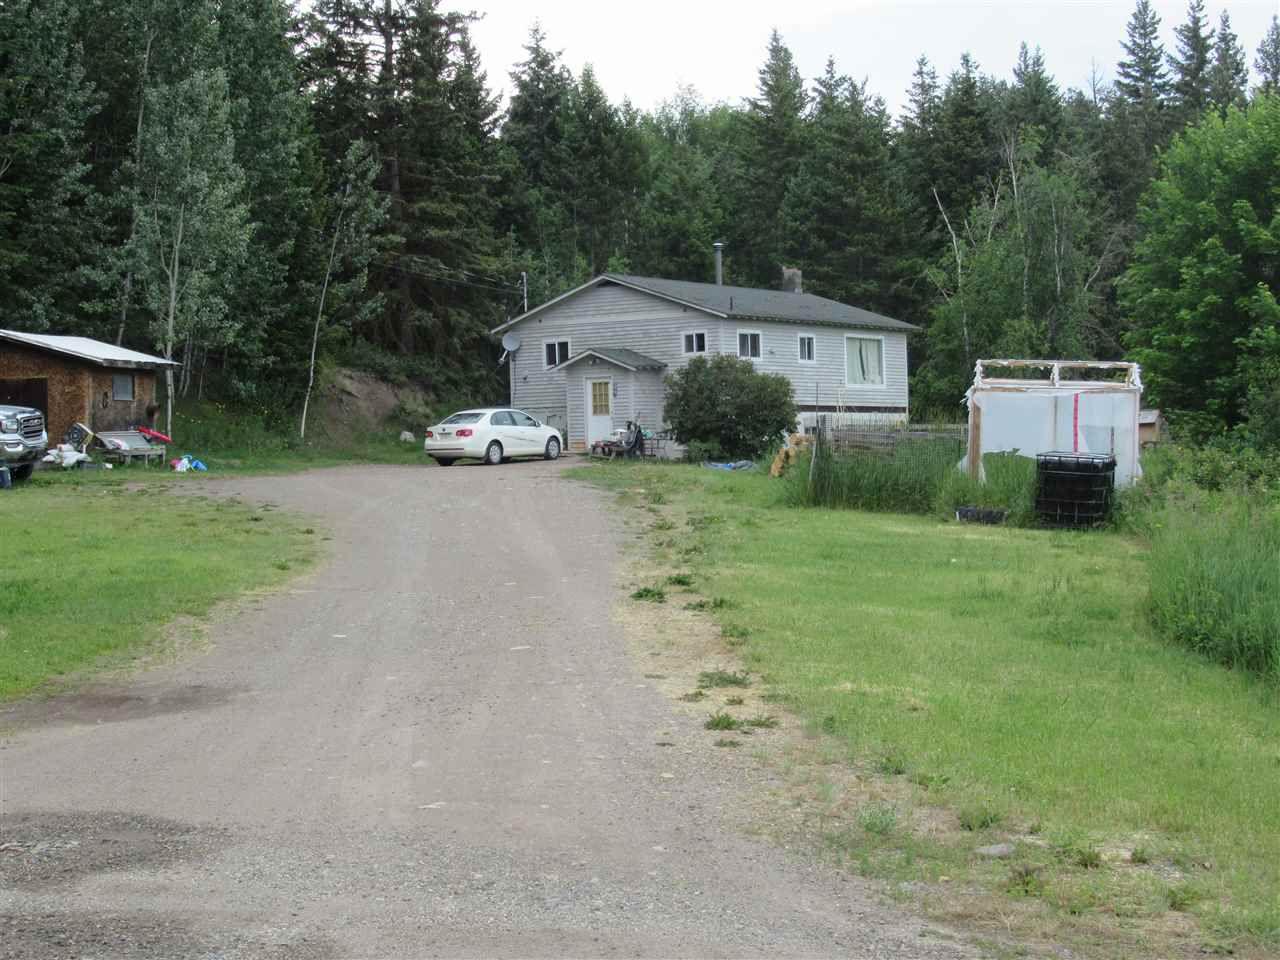 Main Photo: 950 HODGSON Road in Williams Lake: Esler/Dog Creek House for sale (Williams Lake (Zone 27))  : MLS®# R2383953